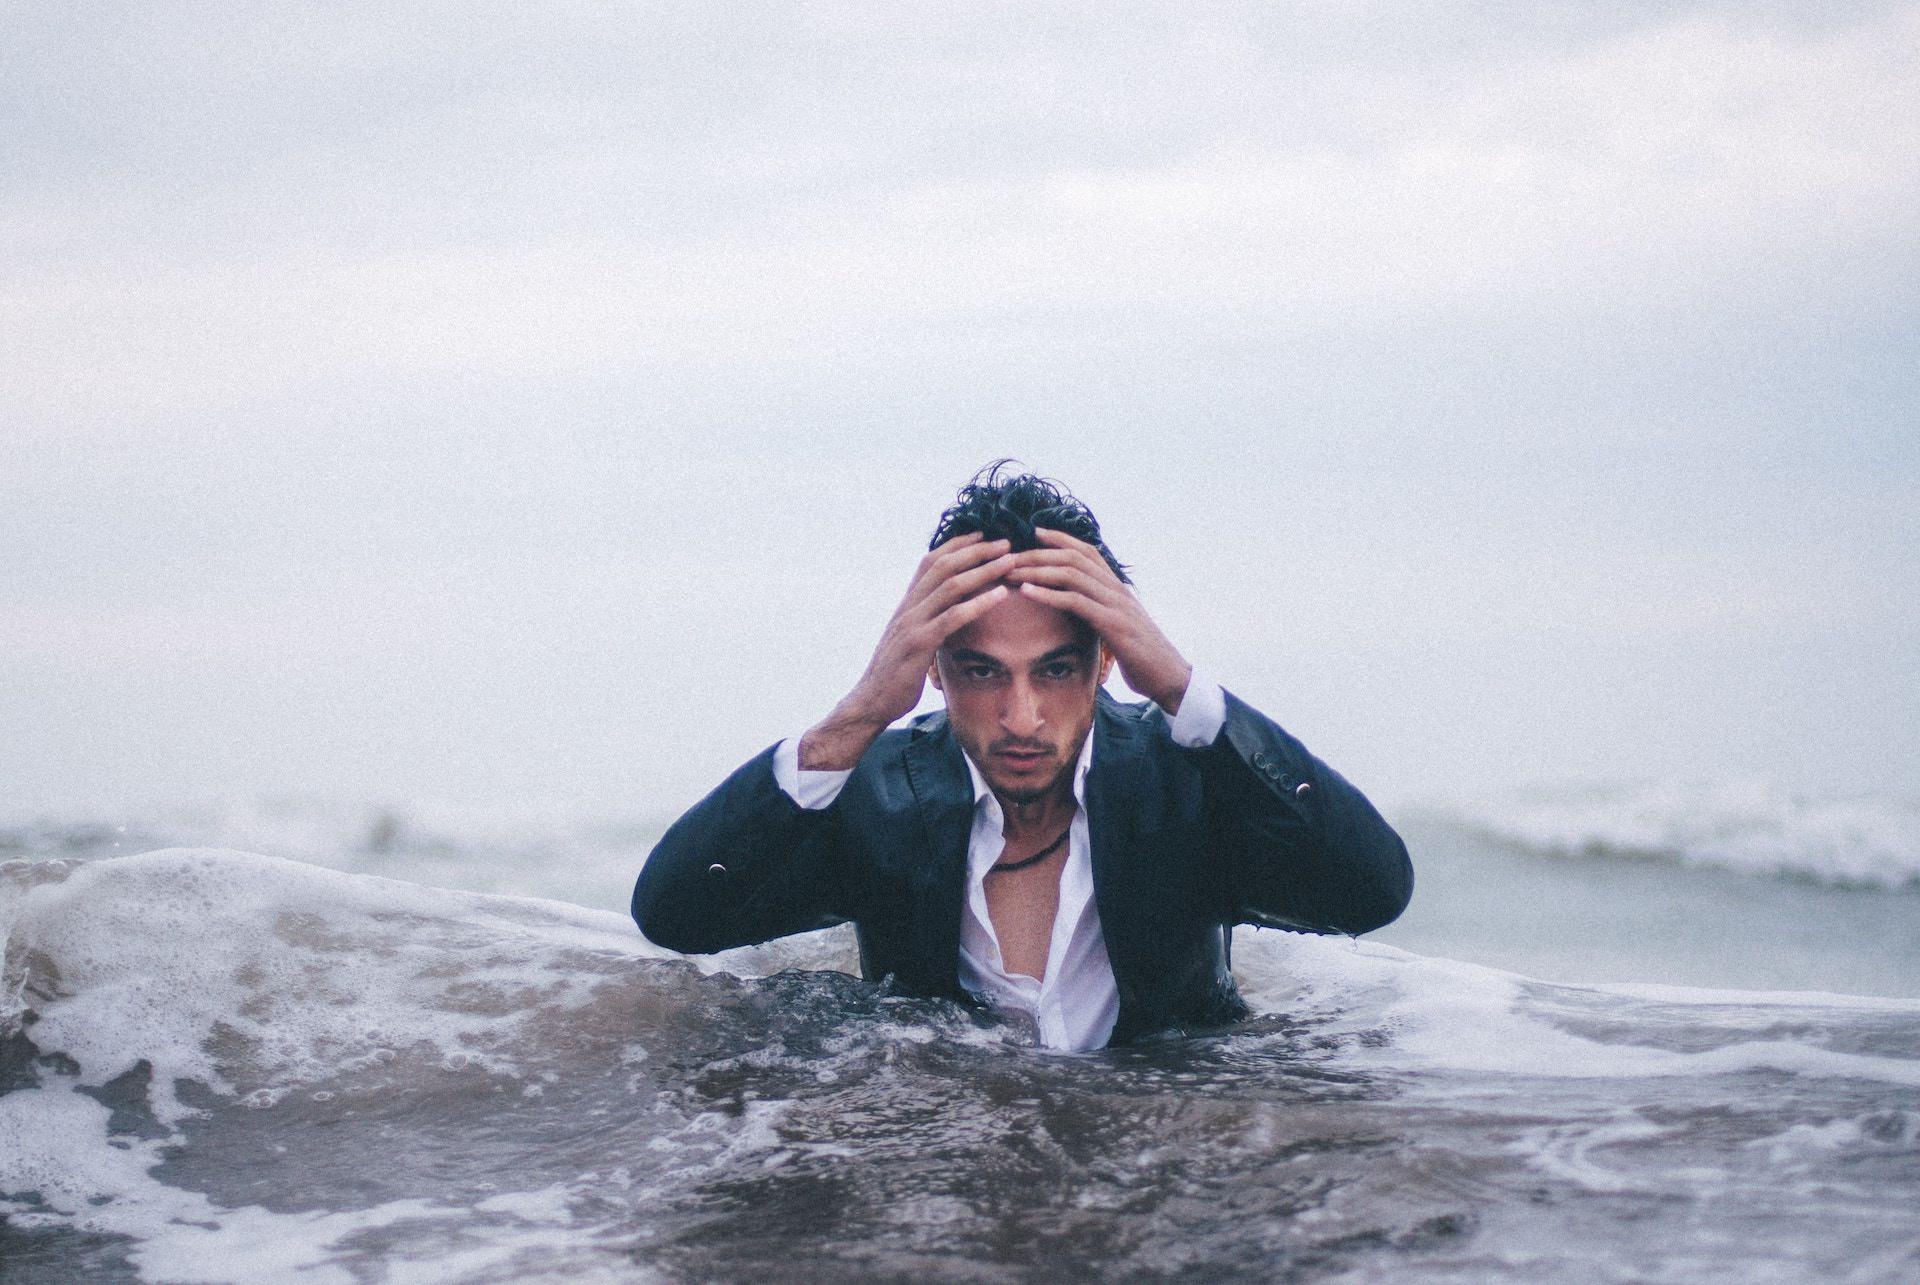 man in deep water image